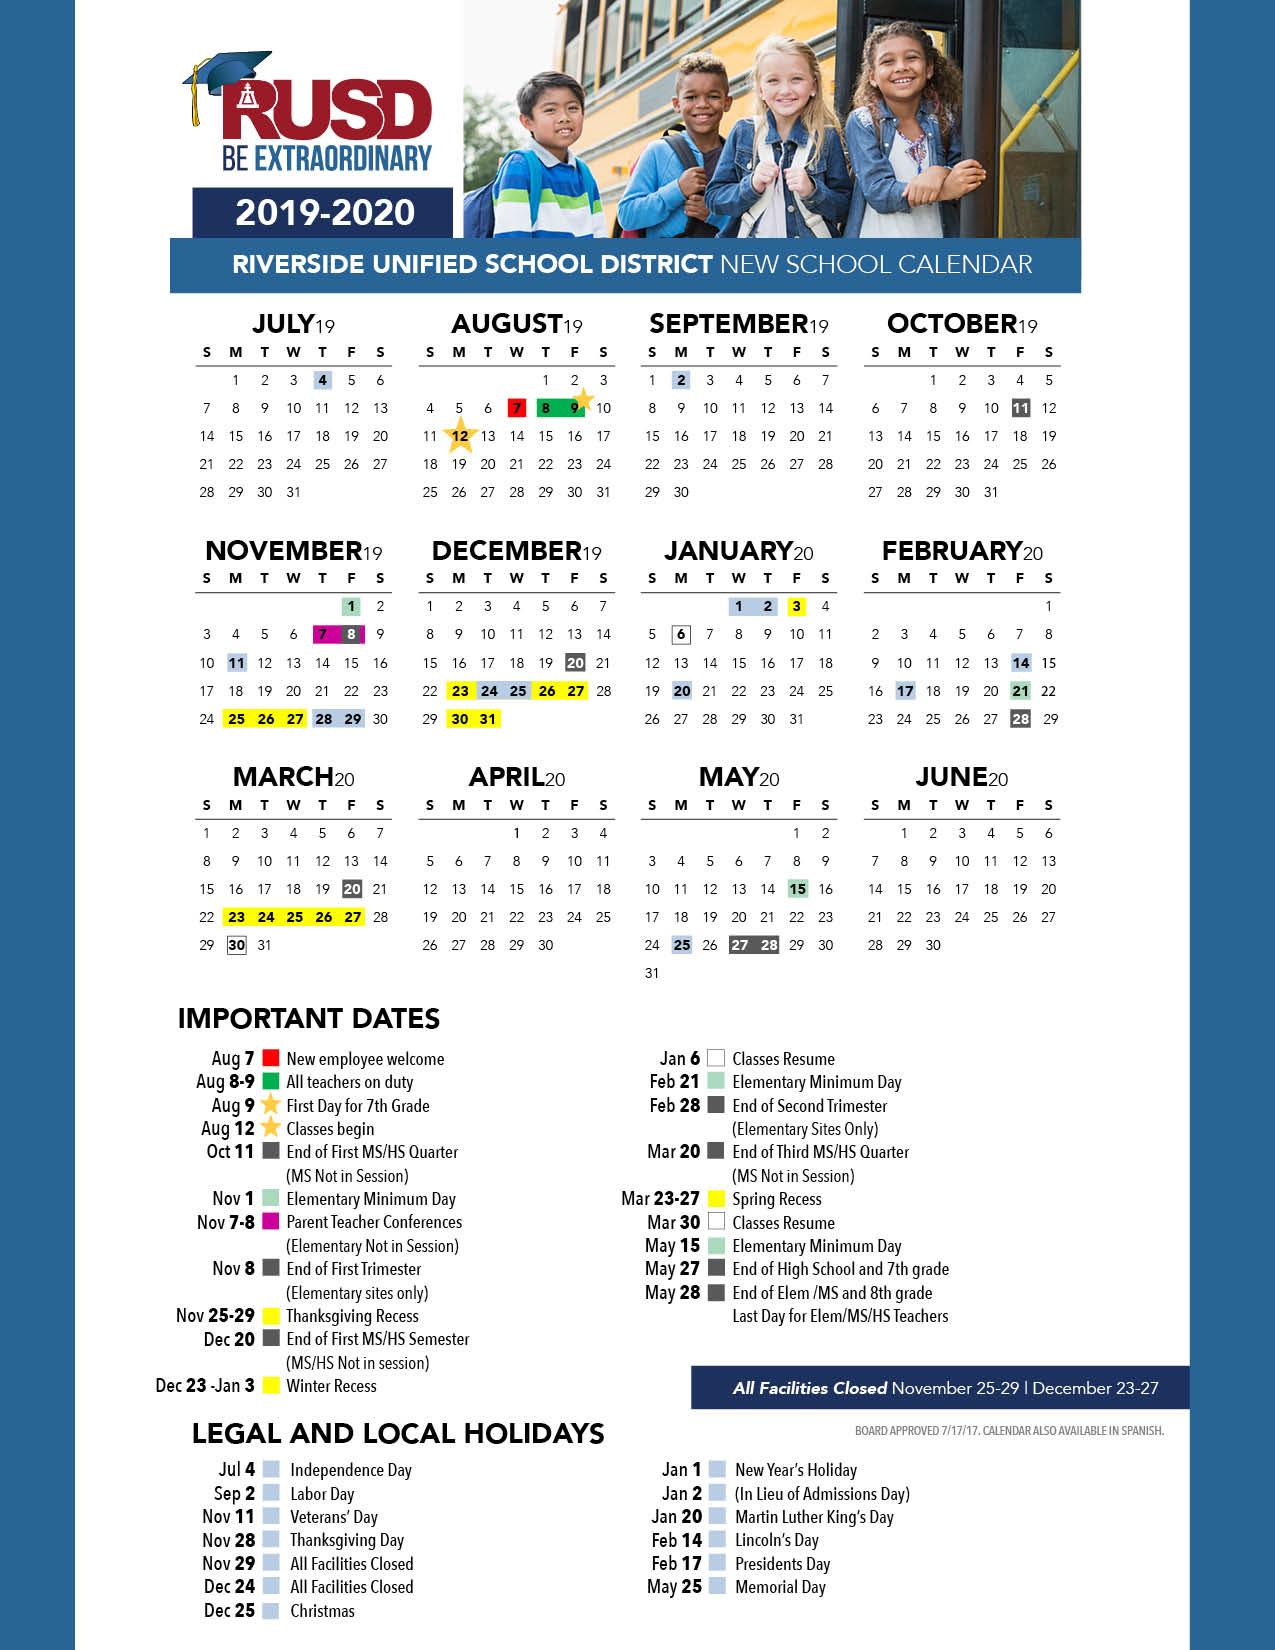 District Calendar - Riverside Unified School District Regarding University Of Southern California School Calendar 2021 2020